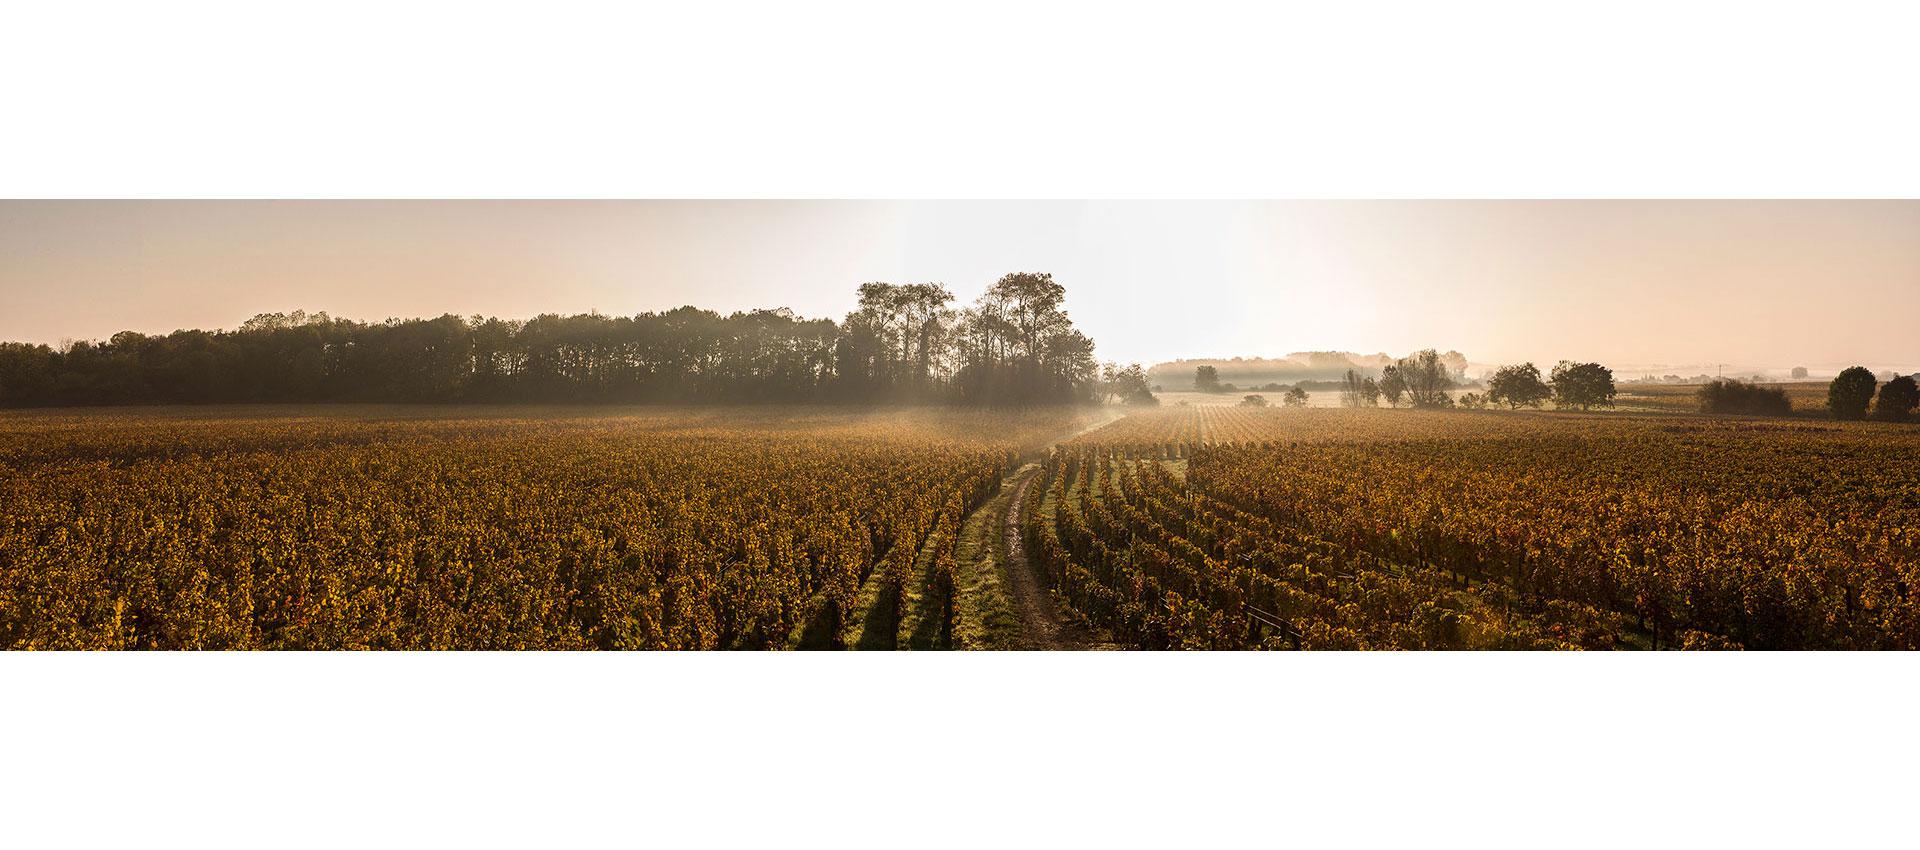 Vignes en Bourgogne en automne